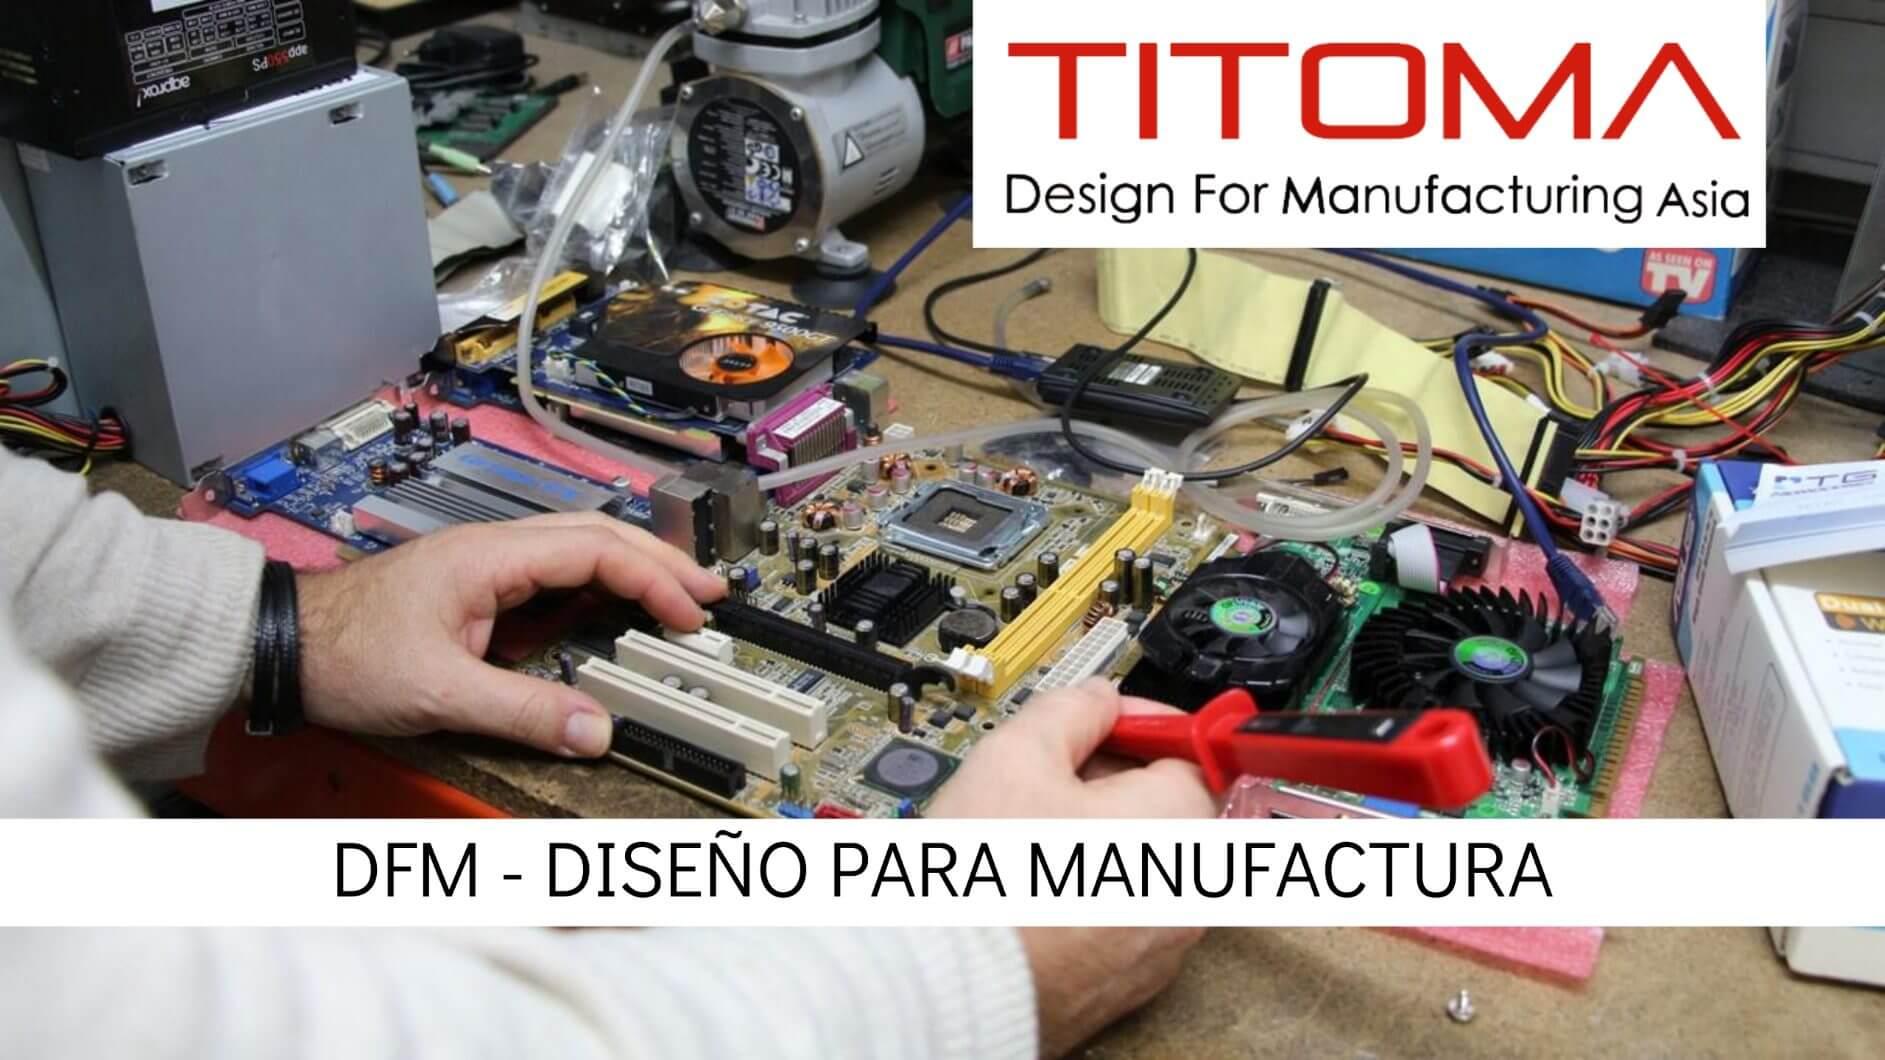 Diseño para manufactura DFM